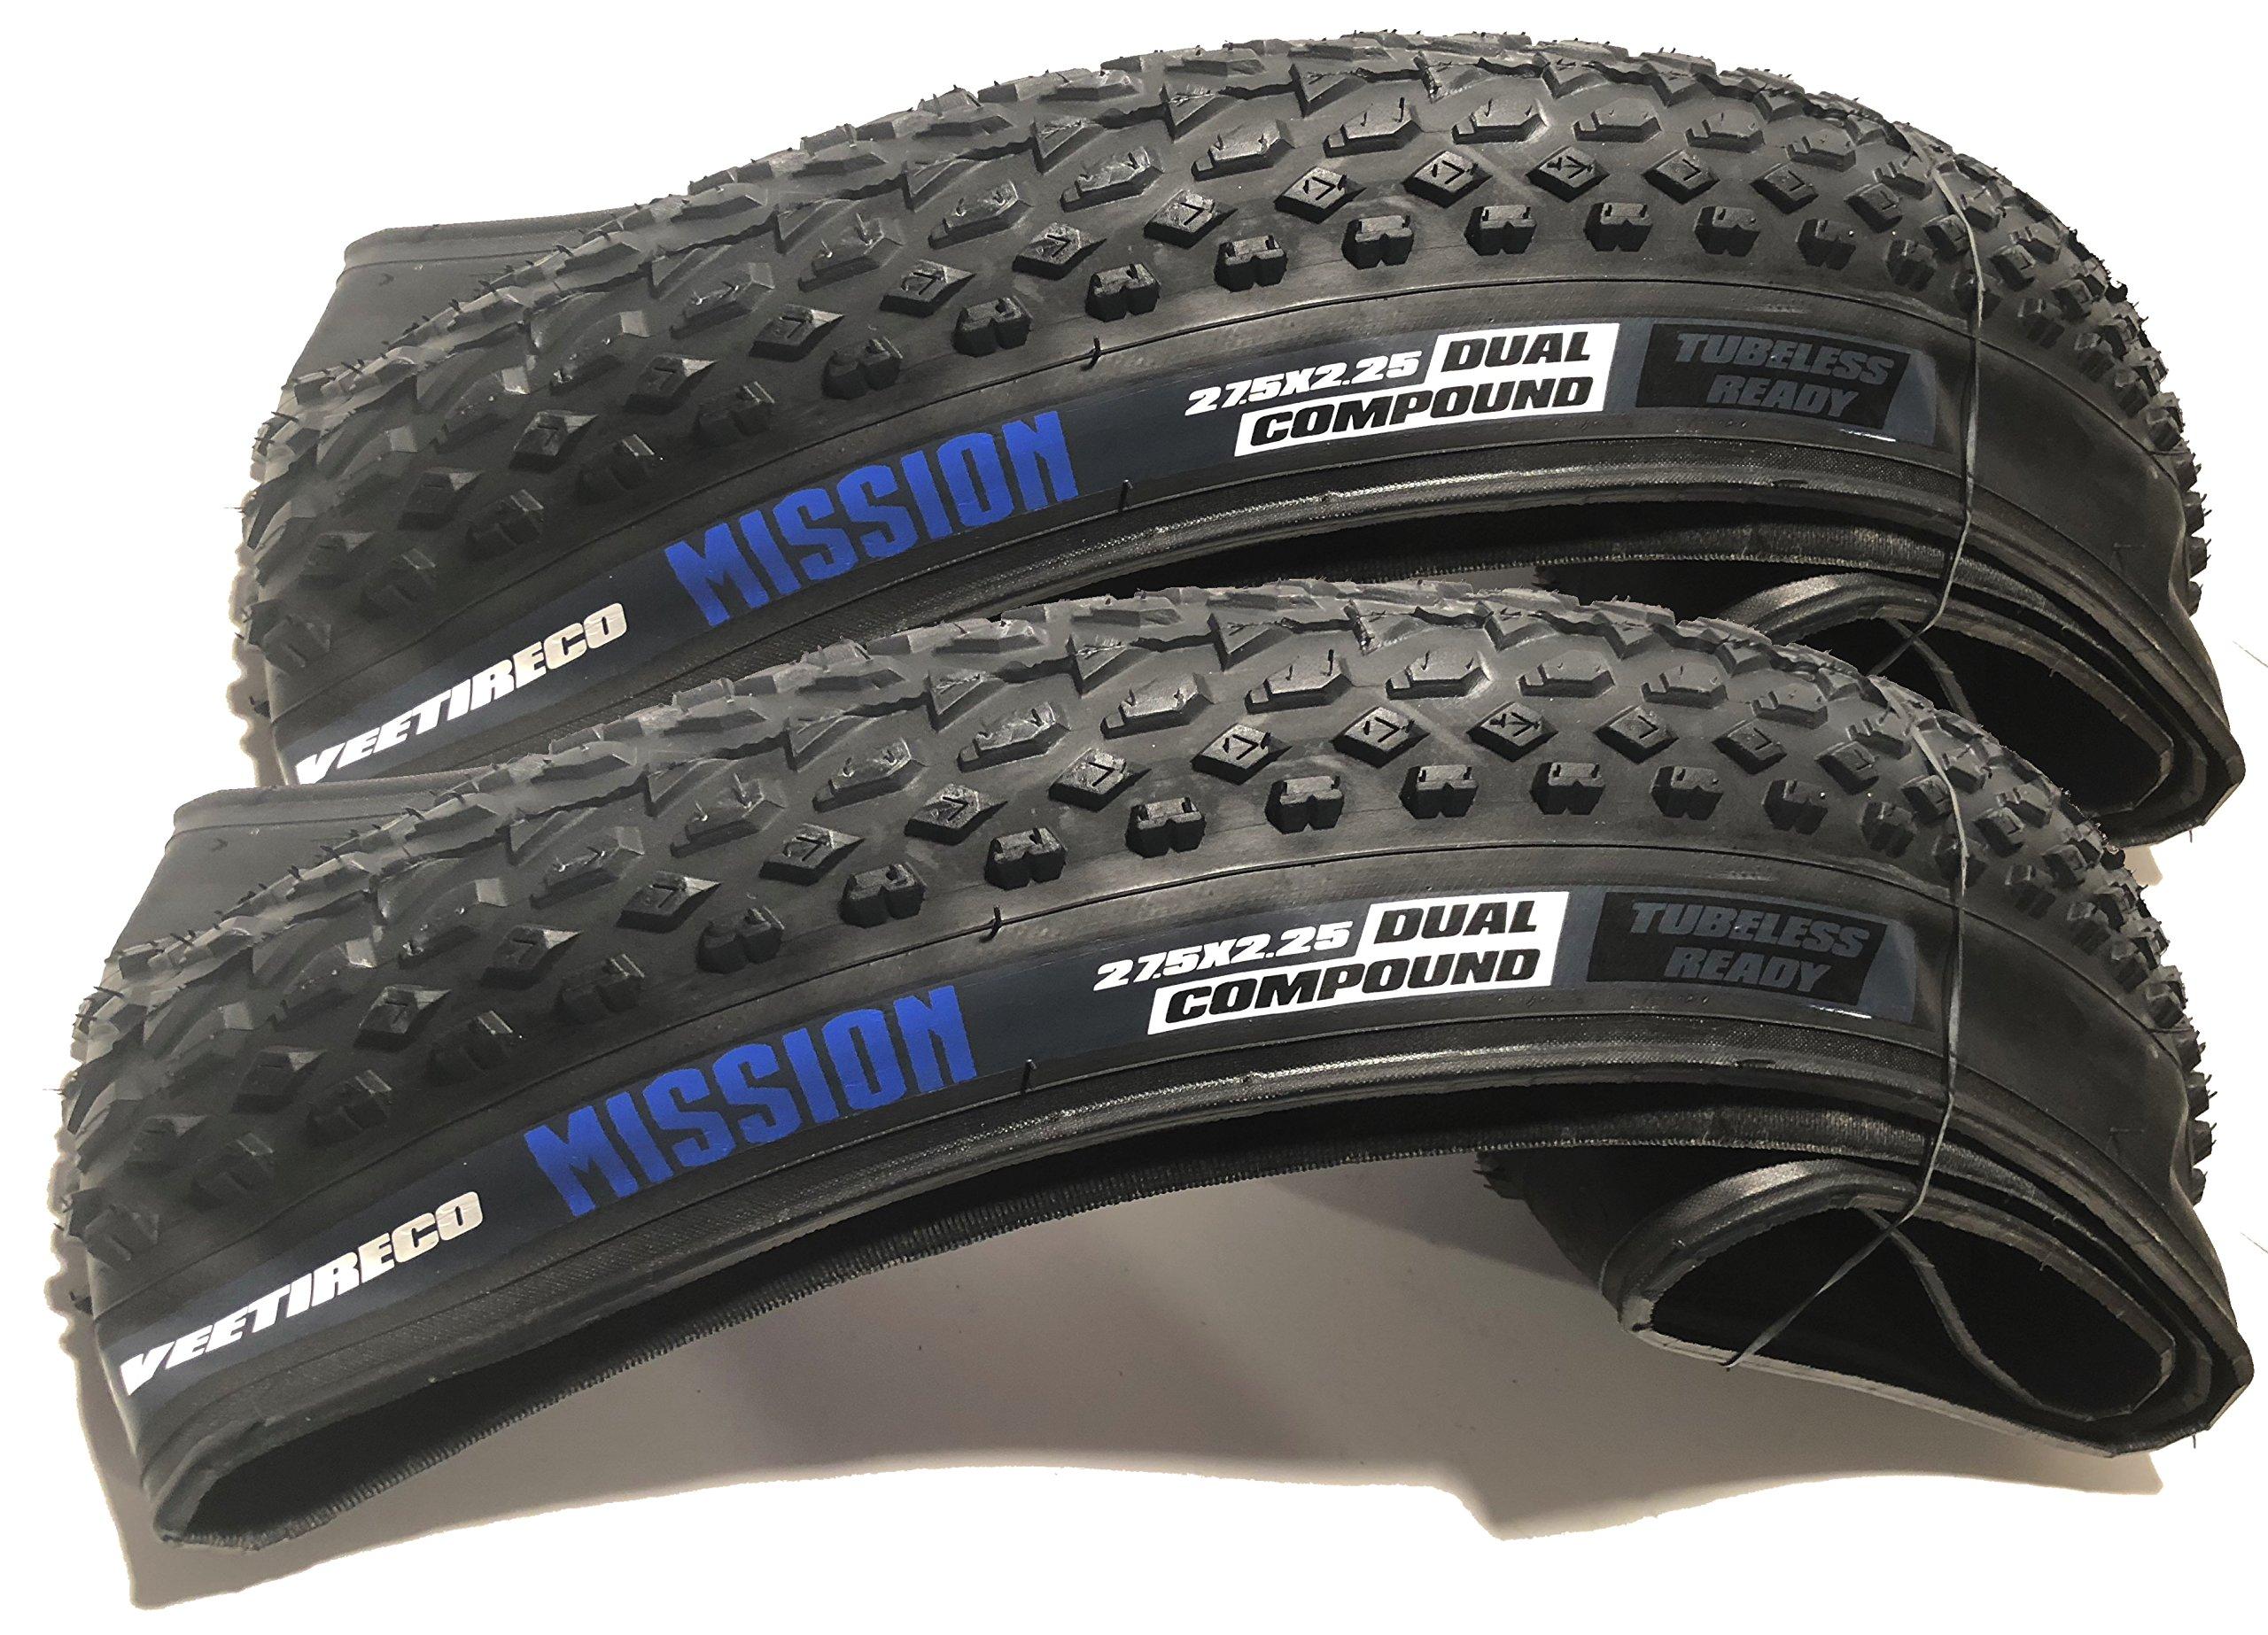 Vee - 2 Mission 27.5x2.25 Bike Tires (Pair) Folding Bead Dual Control Compound